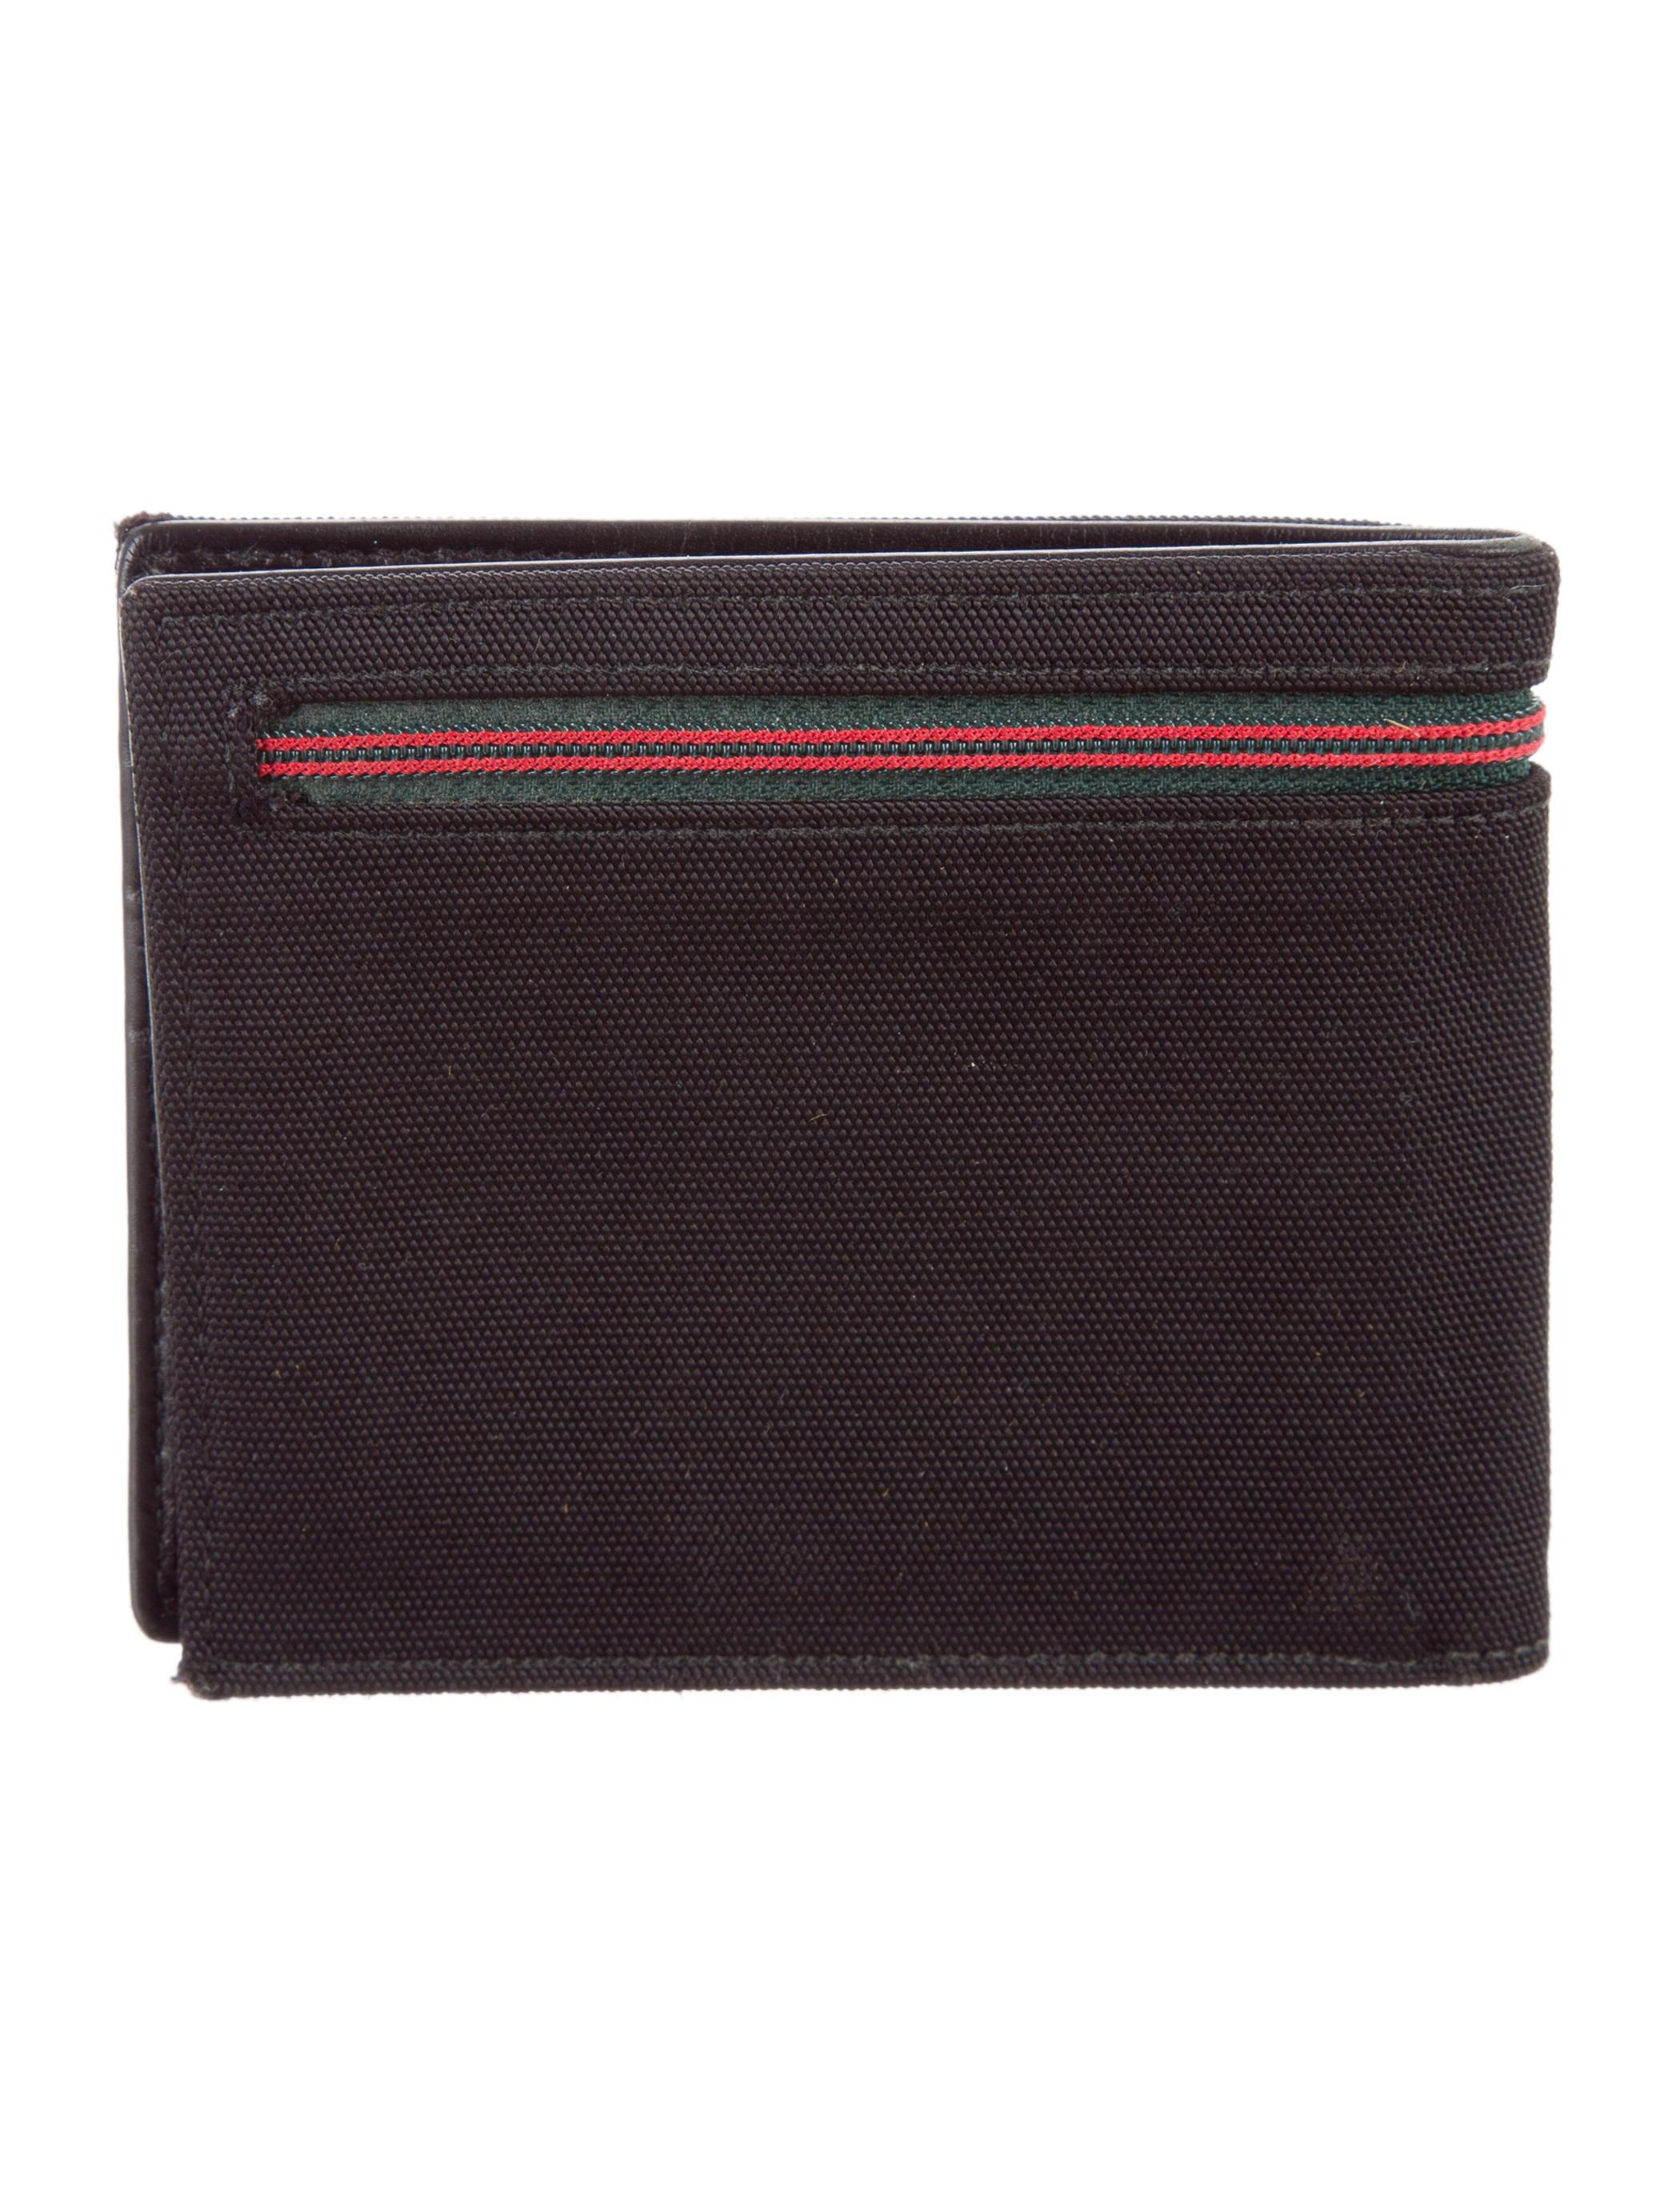 Black Nylon Wallet 65